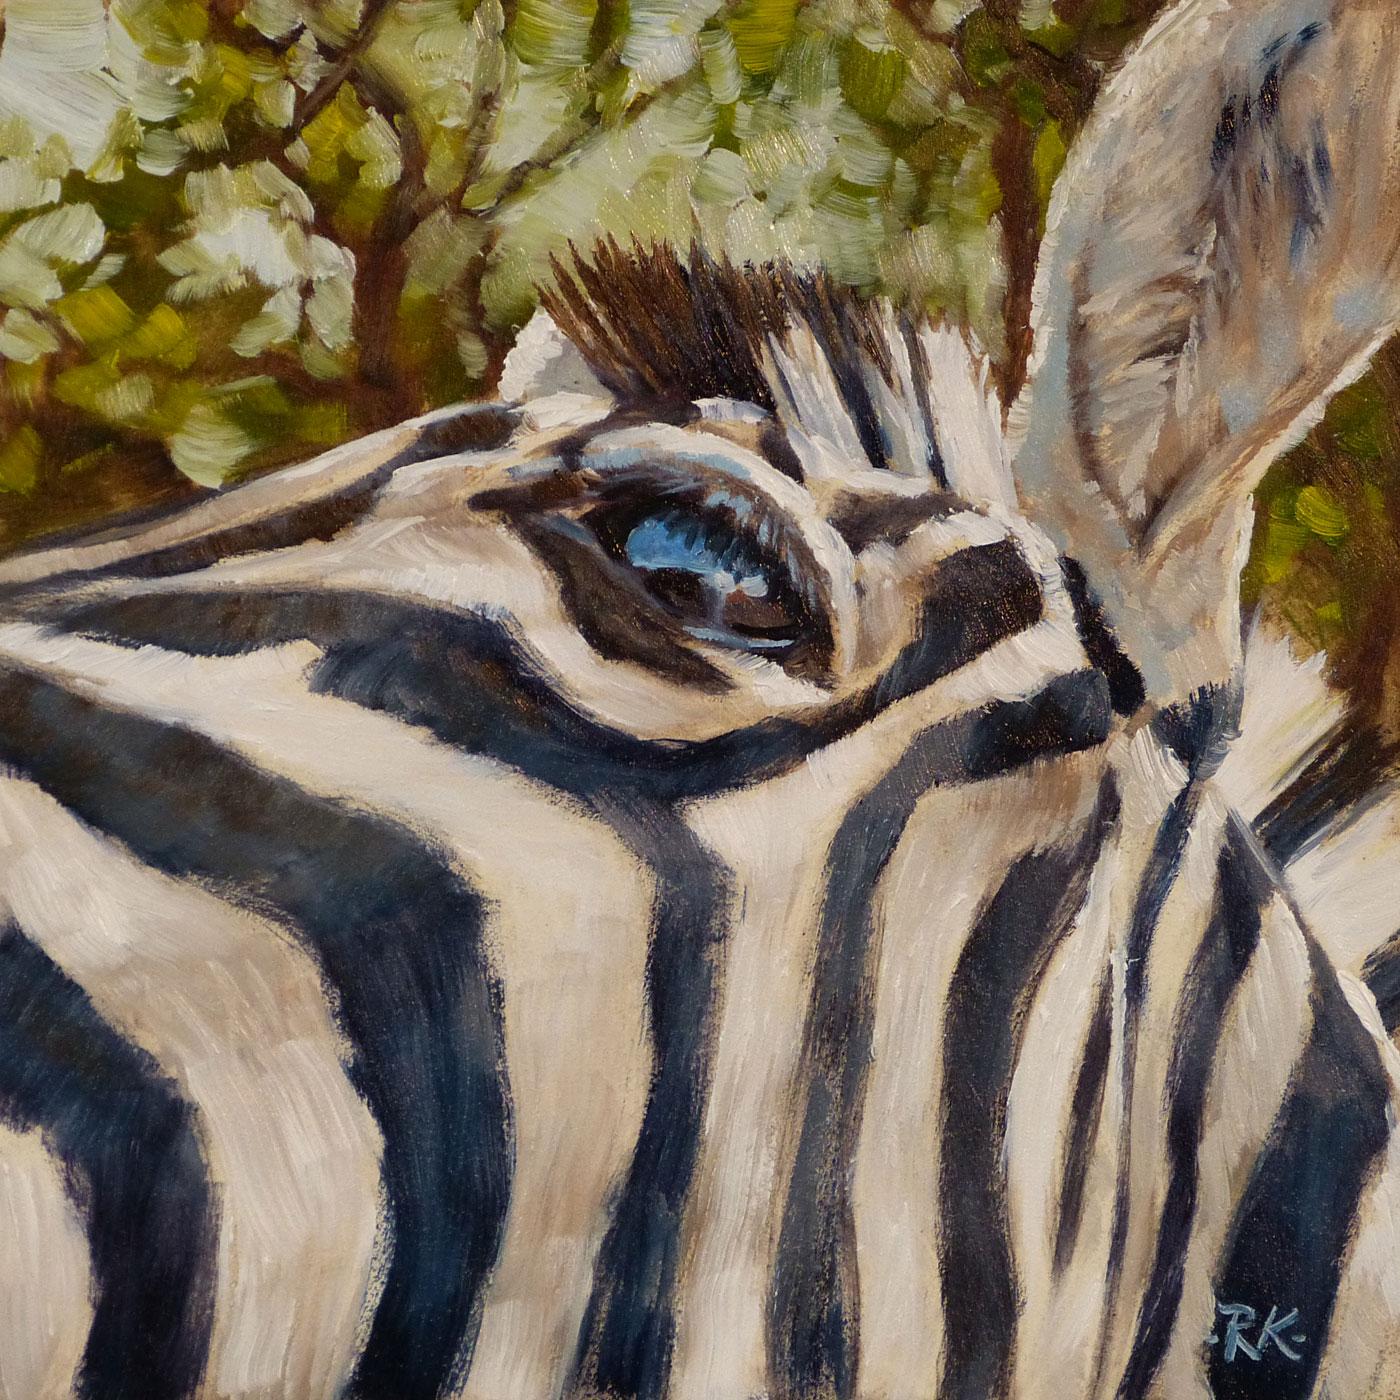 Rita Kirkman's Daily Paintings: Zebra Close Up